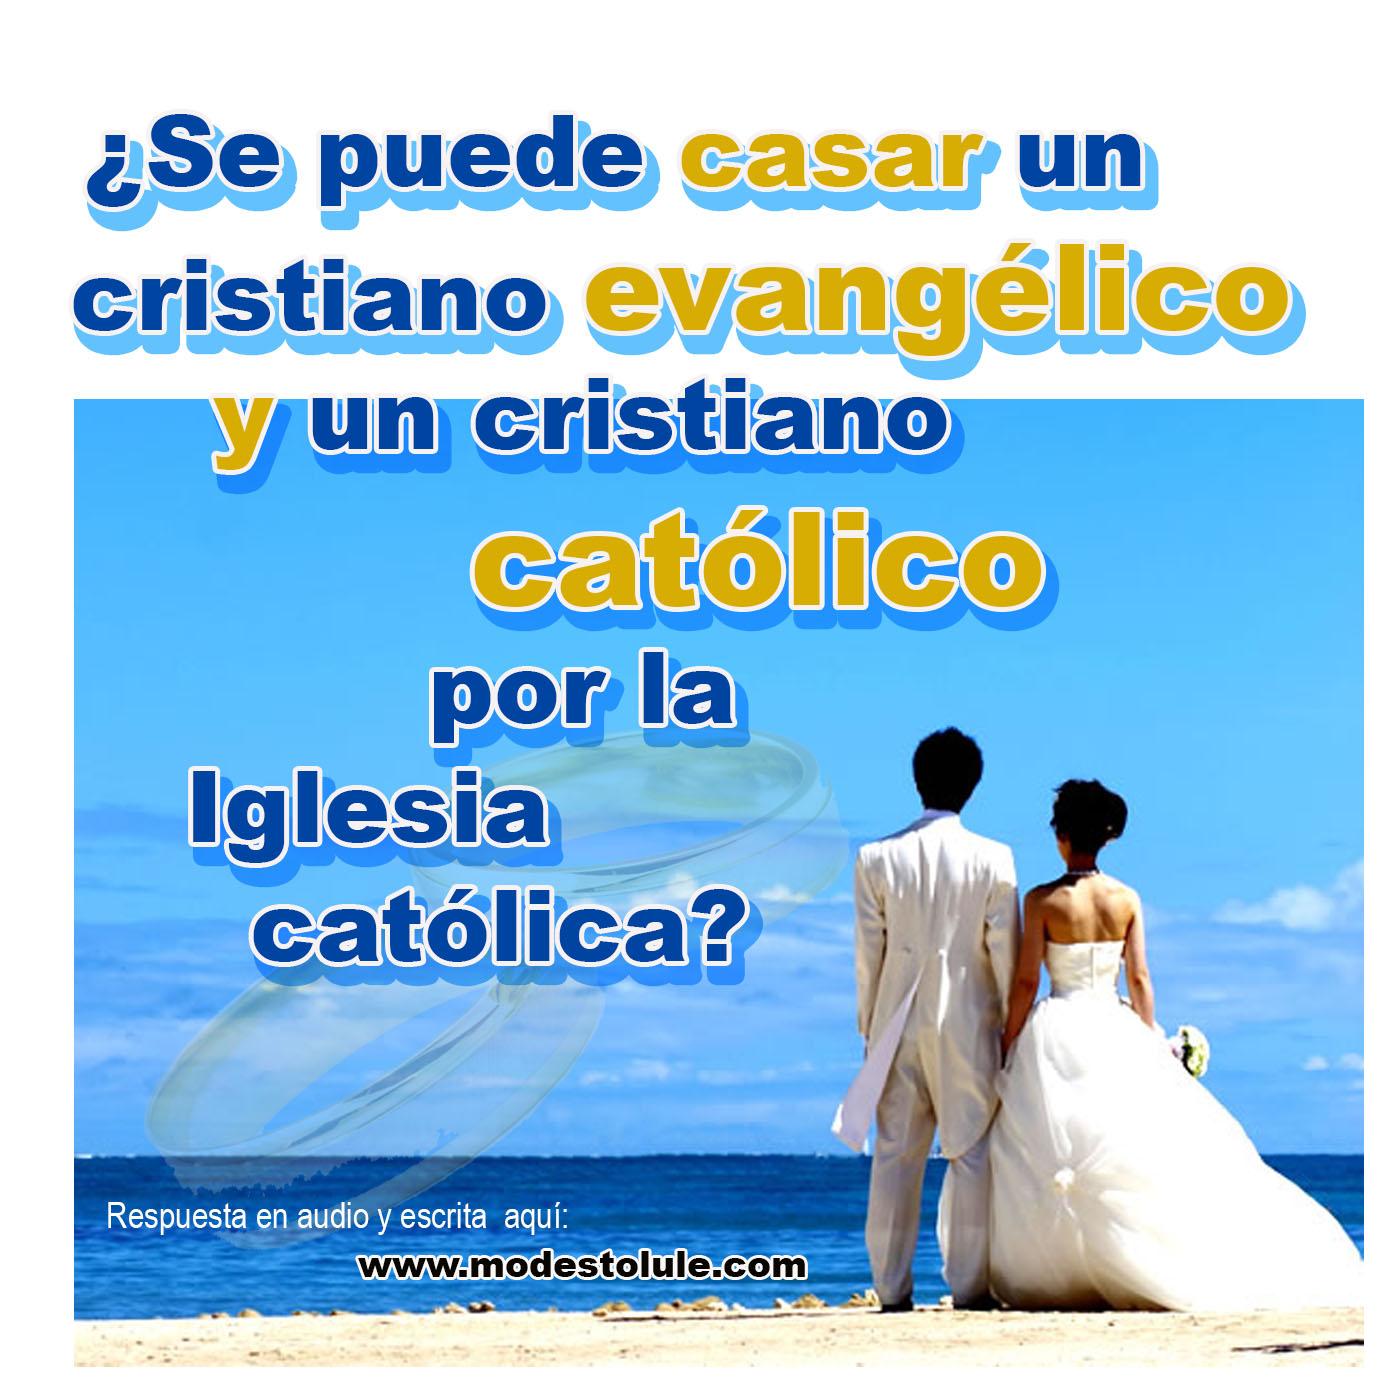 Matrimonio Mixto Catolico Musulman : Matrimonio catÓlico ley canÓnica